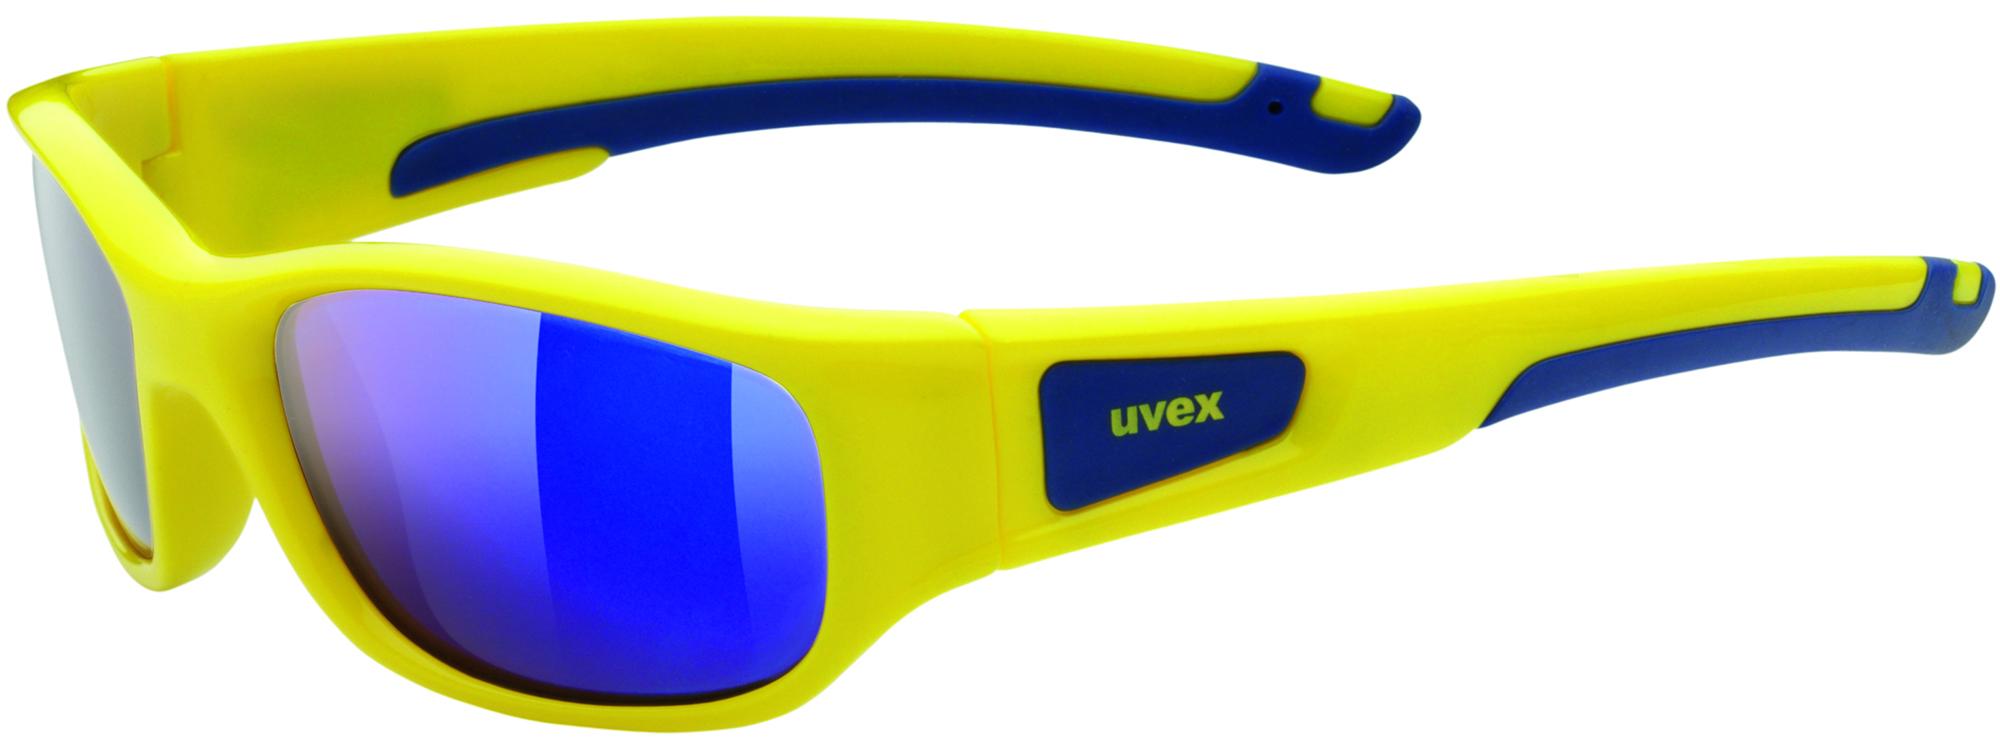 uvex шлем велосипедный uvex i vo c размер 52 56 Uvex Солнцезащитные очки детские Uvex Sportstyle 506